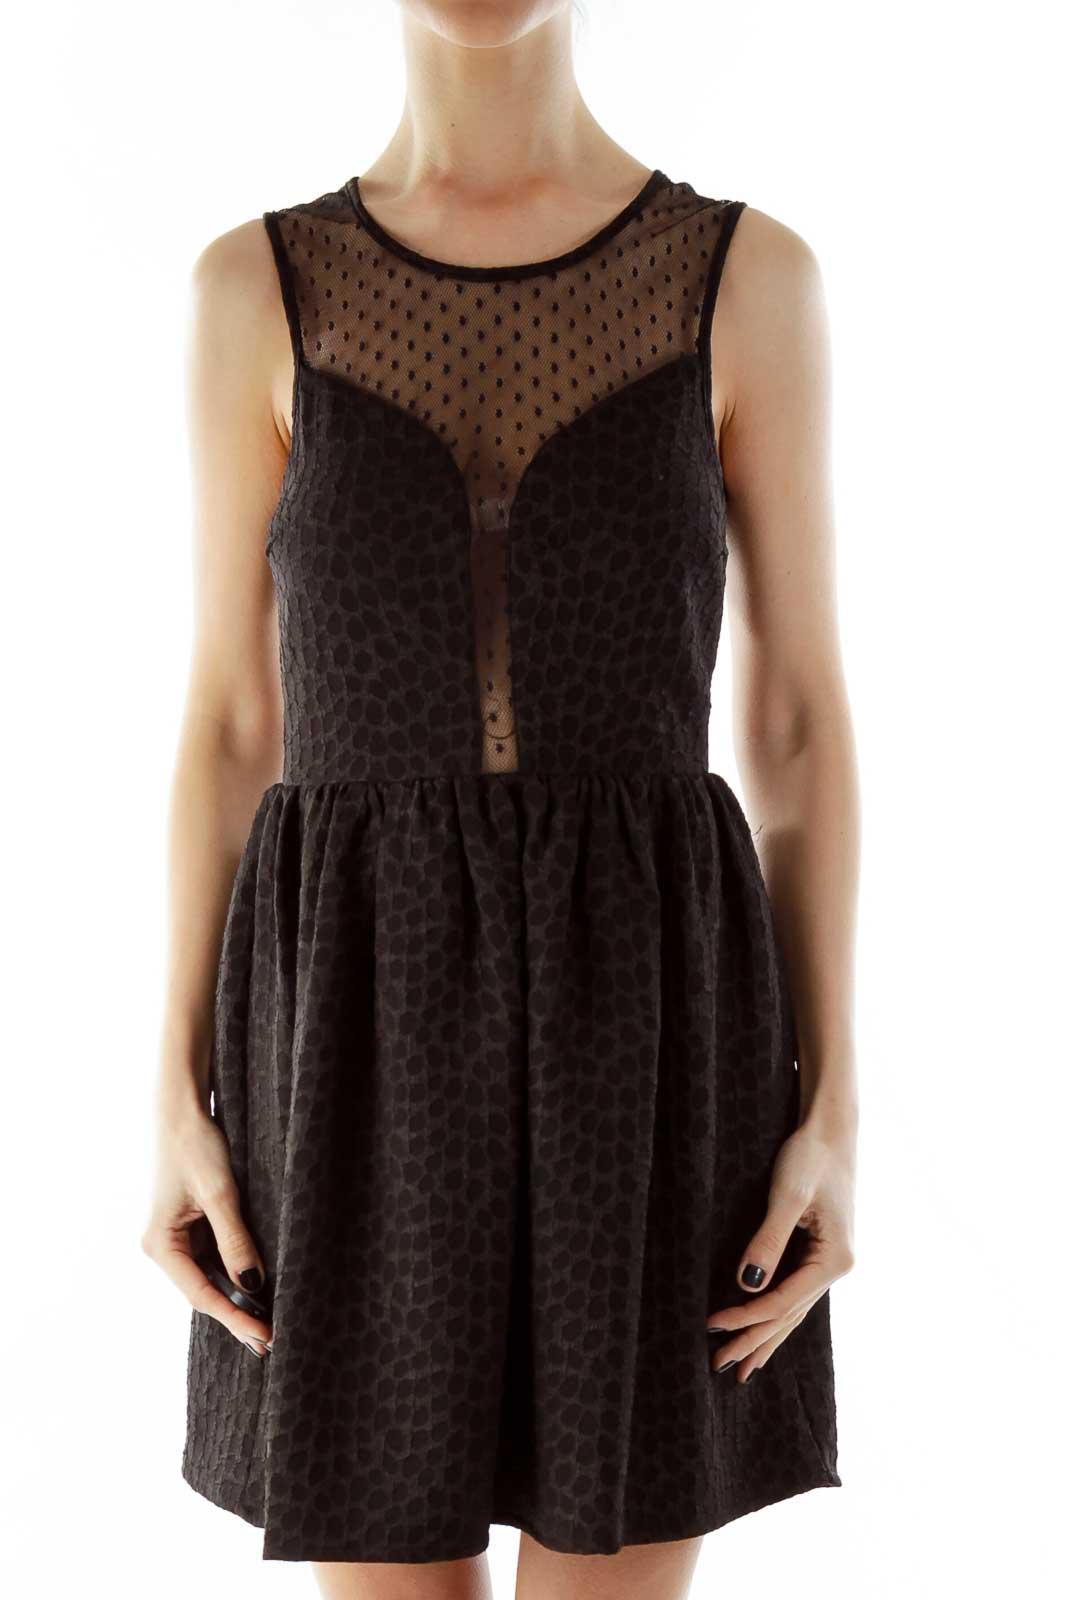 Black Polka-Dot See Through Textured Dress Front